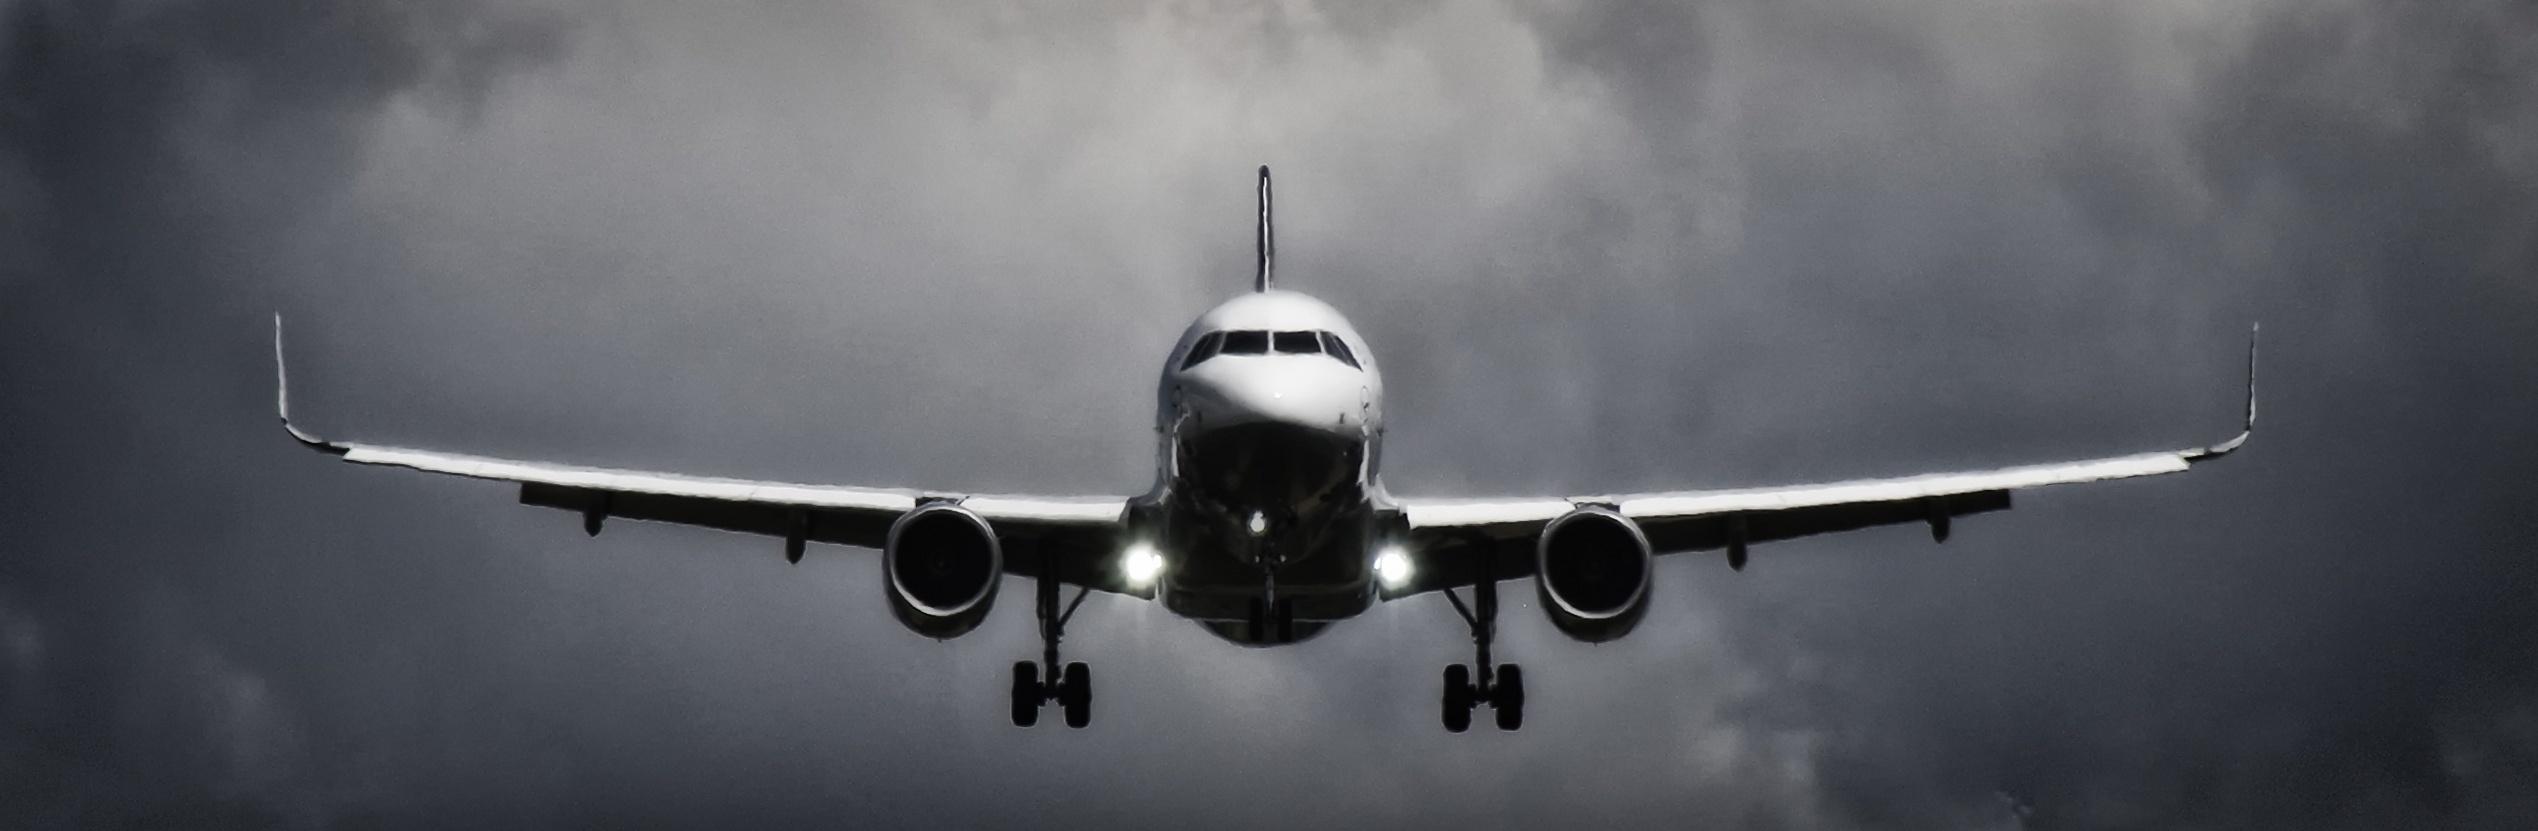 Aero Sector Specialists